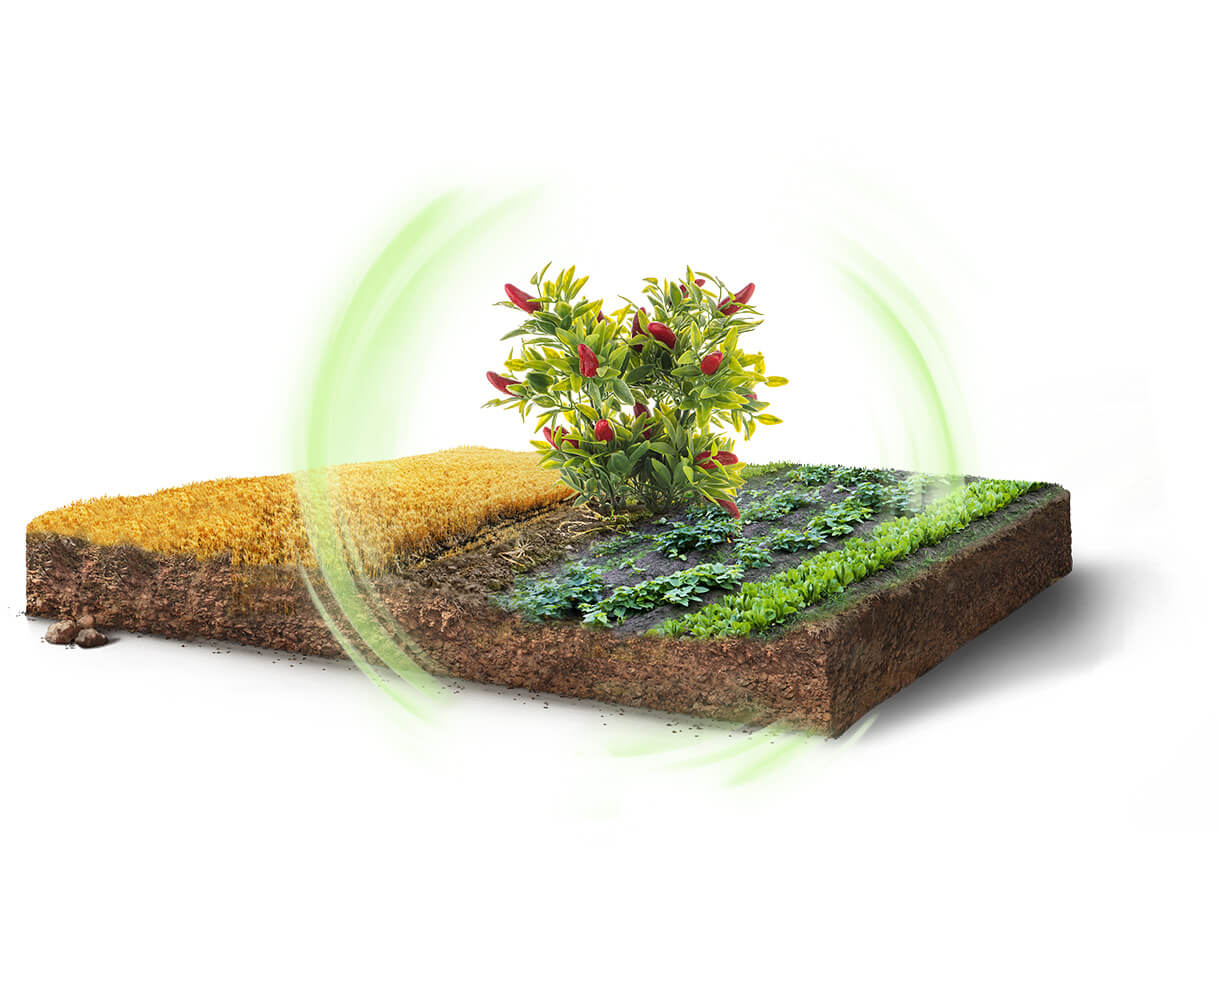 Where Nature and Efficacy Walk Hand-in-Hand